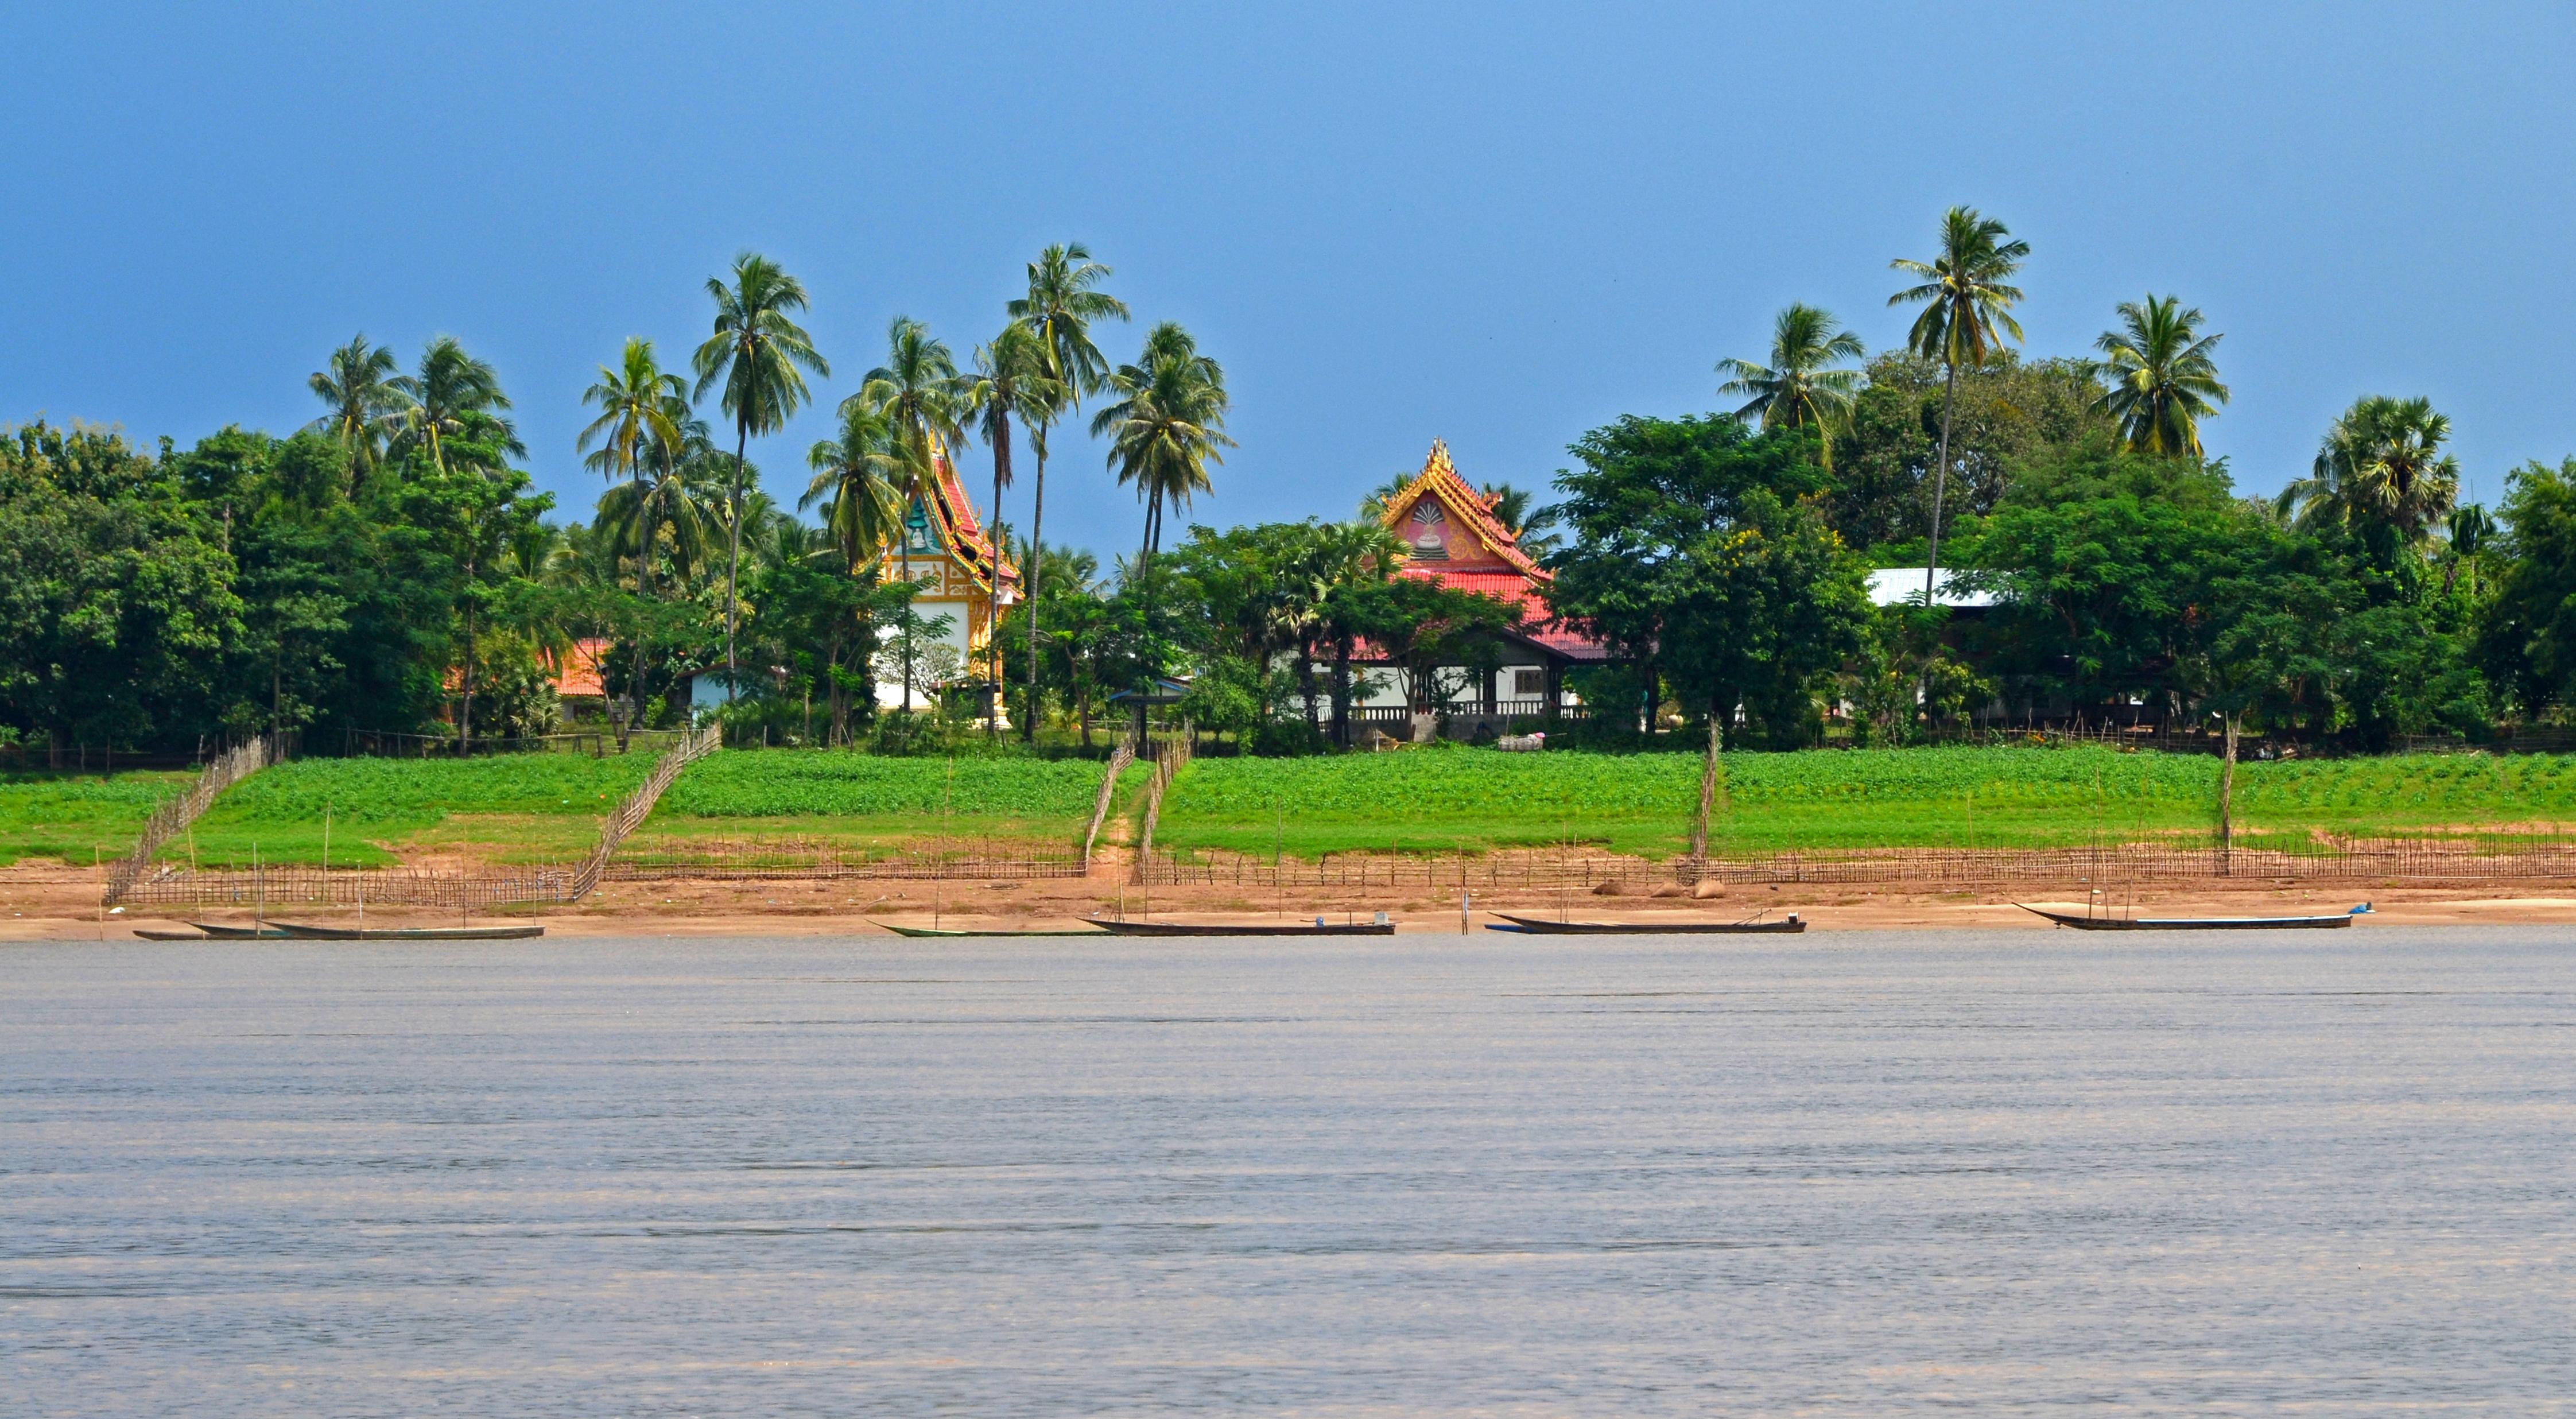 ile-don-daeng-laos-360-degres